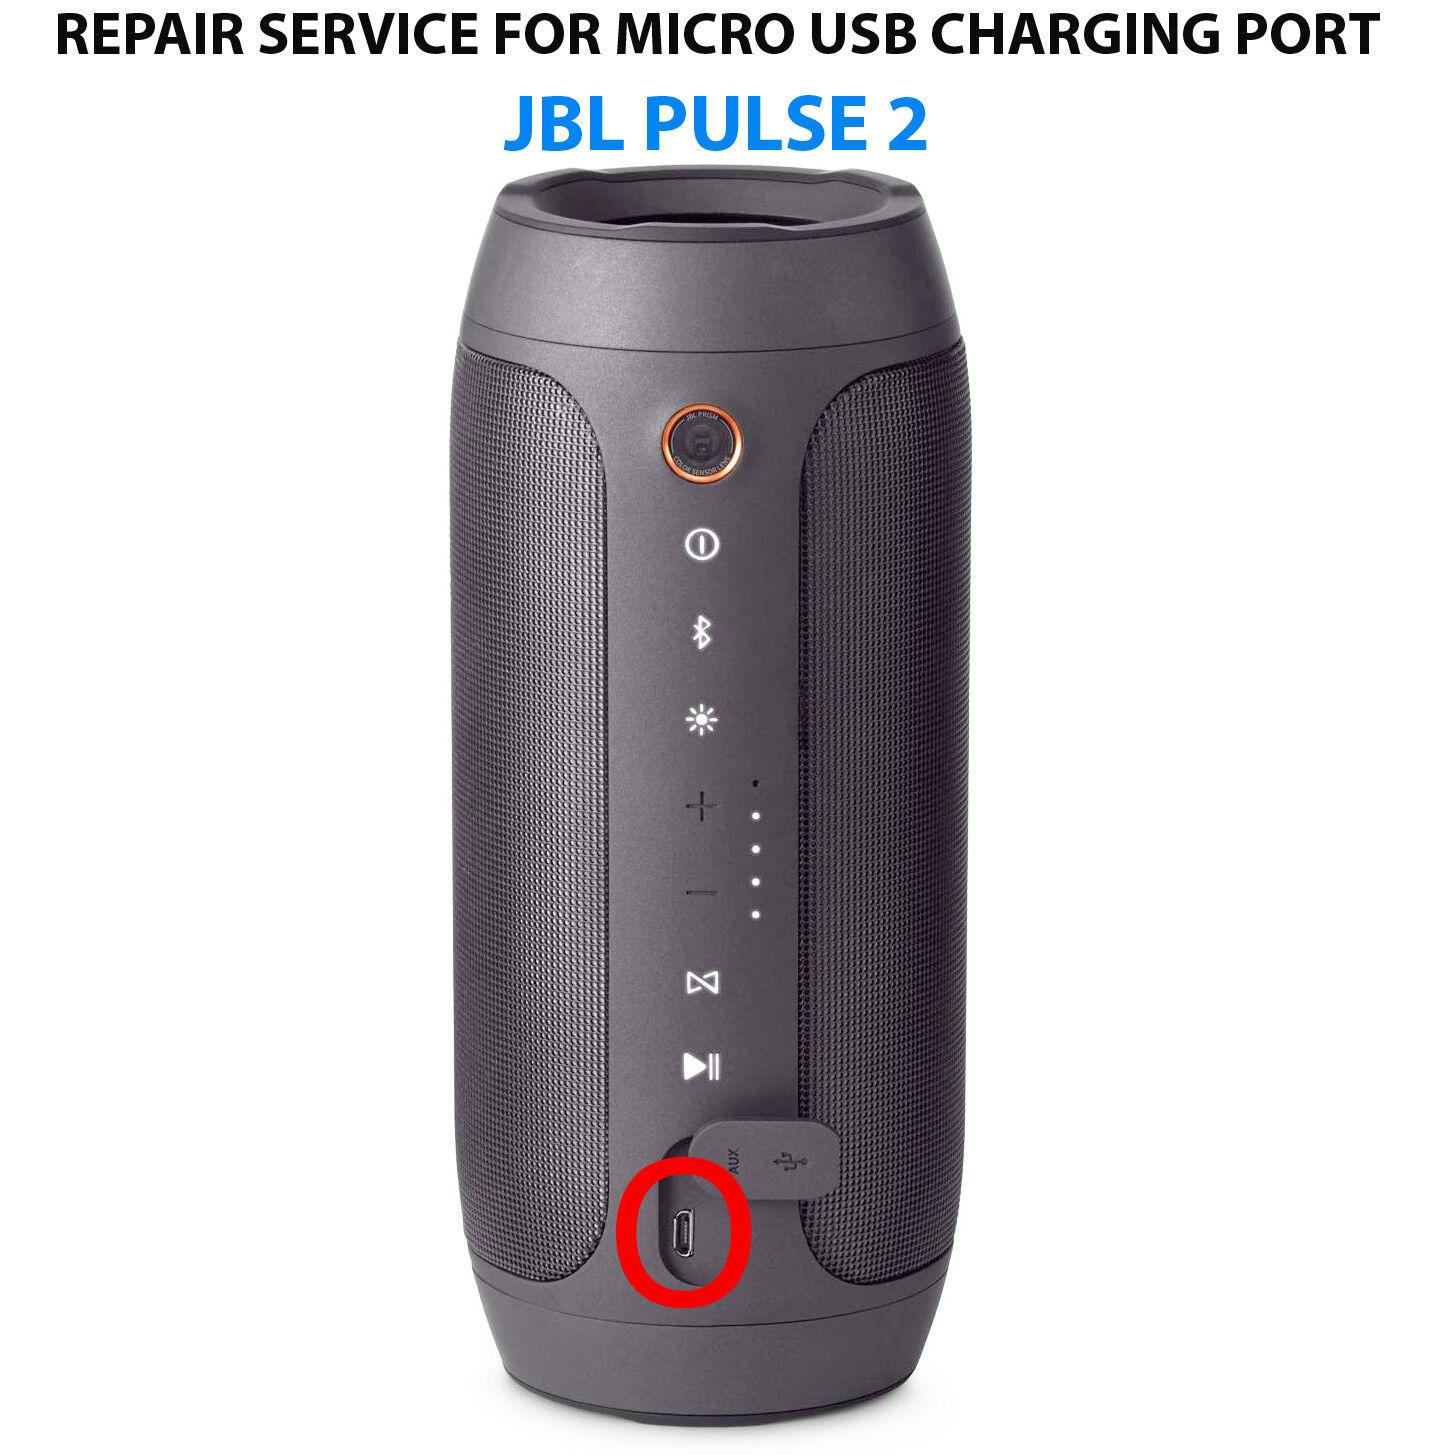 JBL Pulse Bluetooth Speaker Fast Repair Service for Micro USB Charging Port